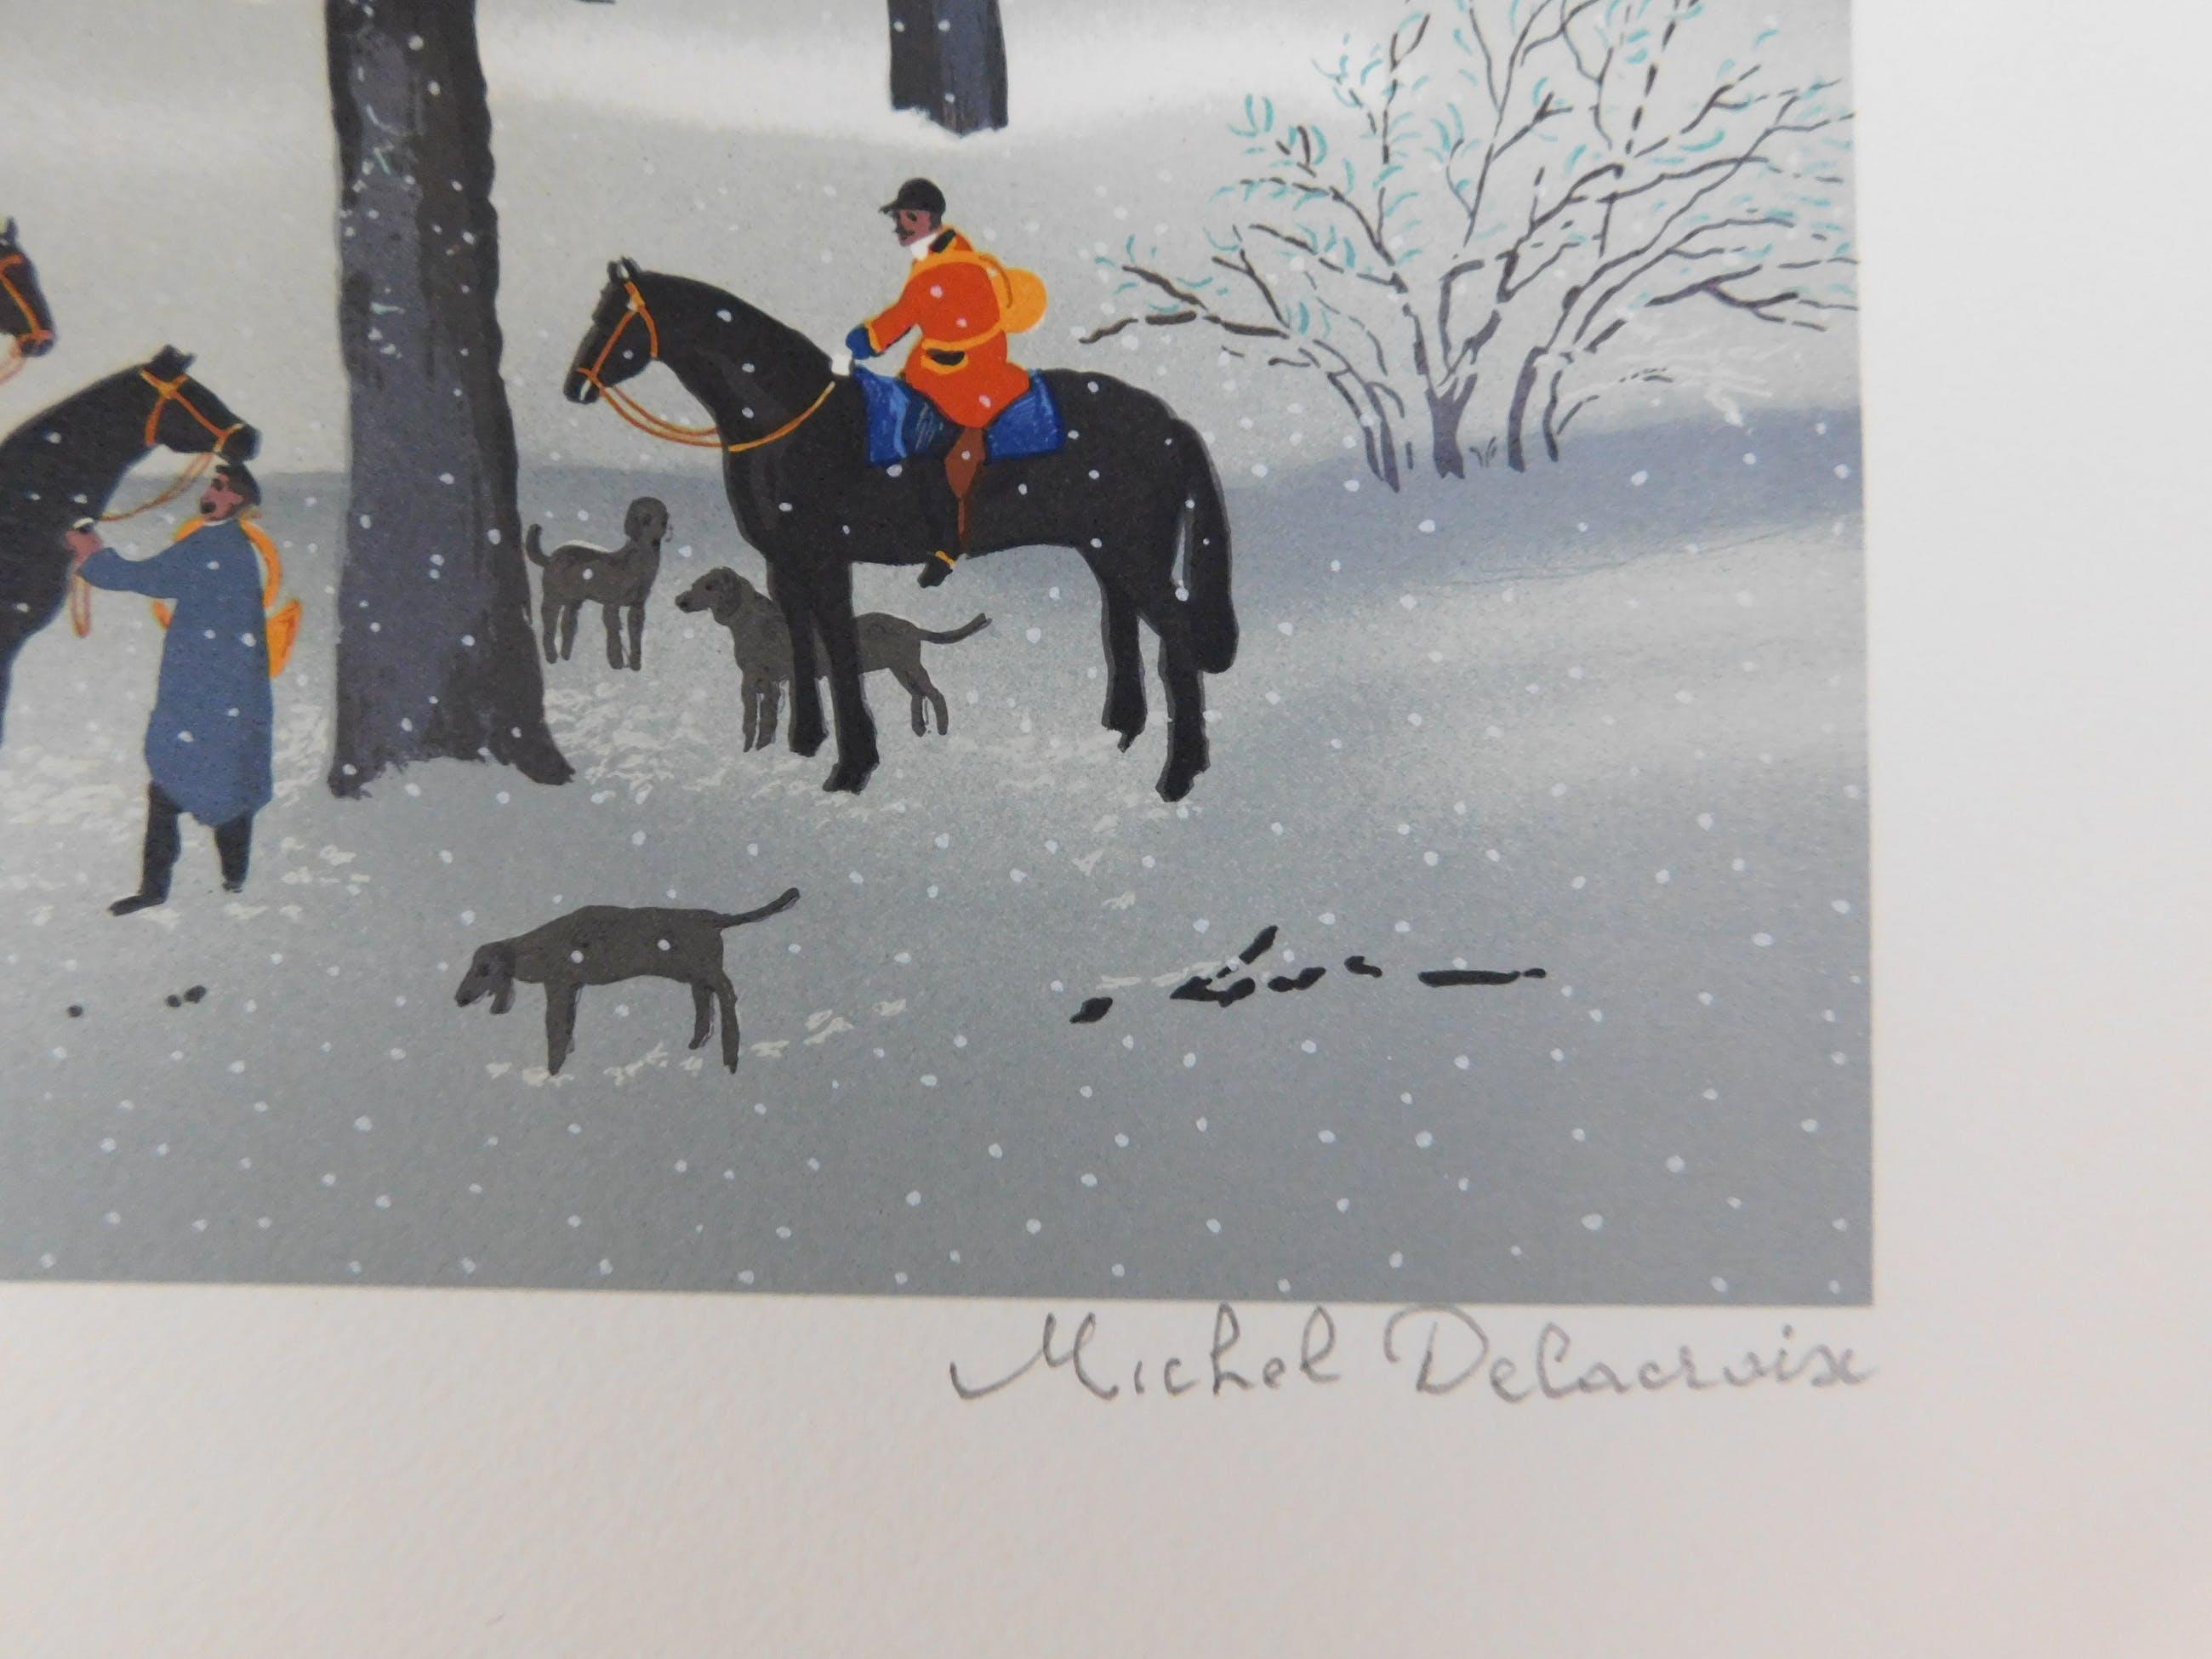 Michel Delacroix - La Chasse d'Hiver kopen? Bied vanaf 40!